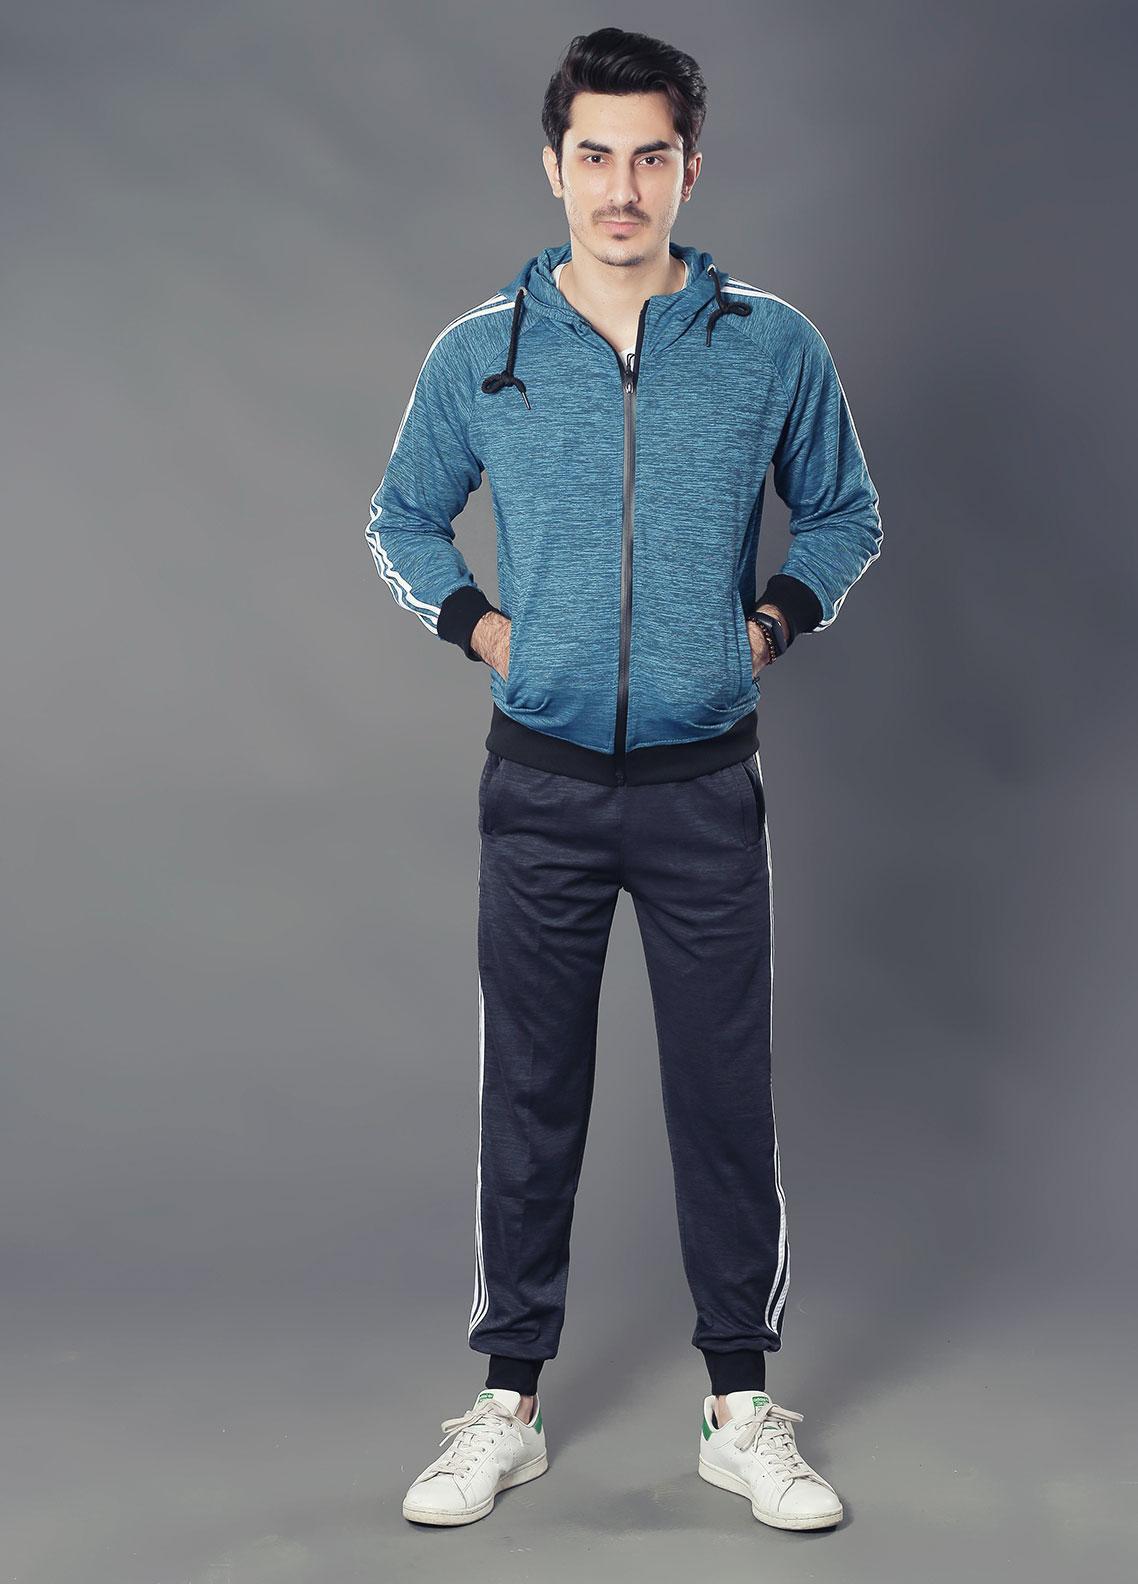 Sanaulla Exclusive Range Premium Jersey Track Suits for Men -  19-89556 Grey